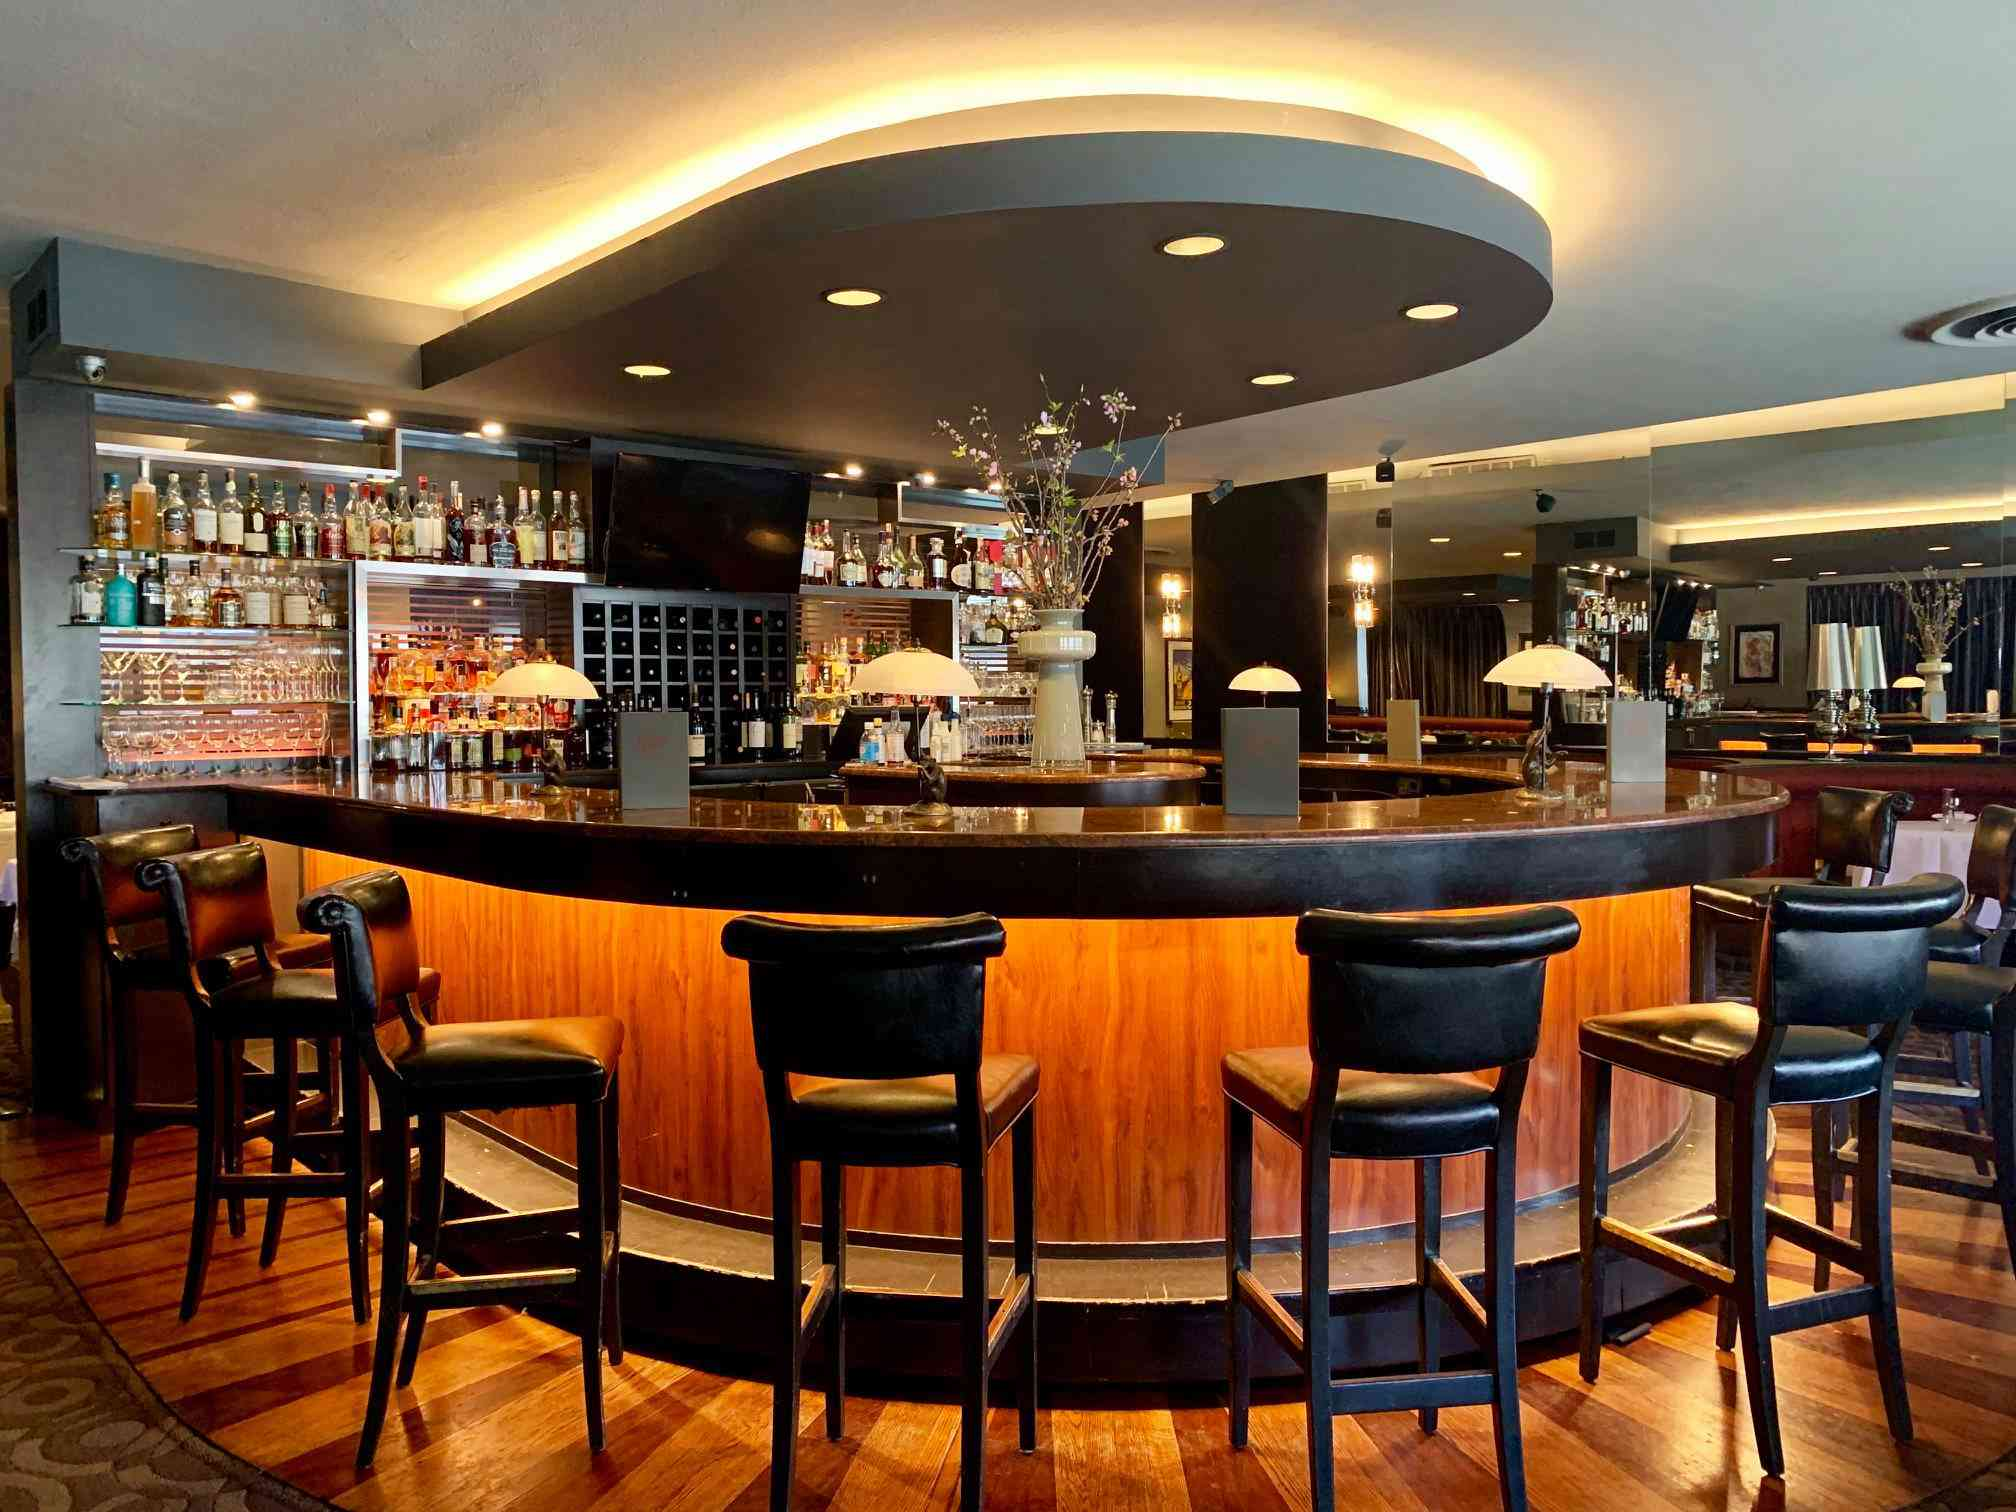 The bar at Oliver's Restaurant